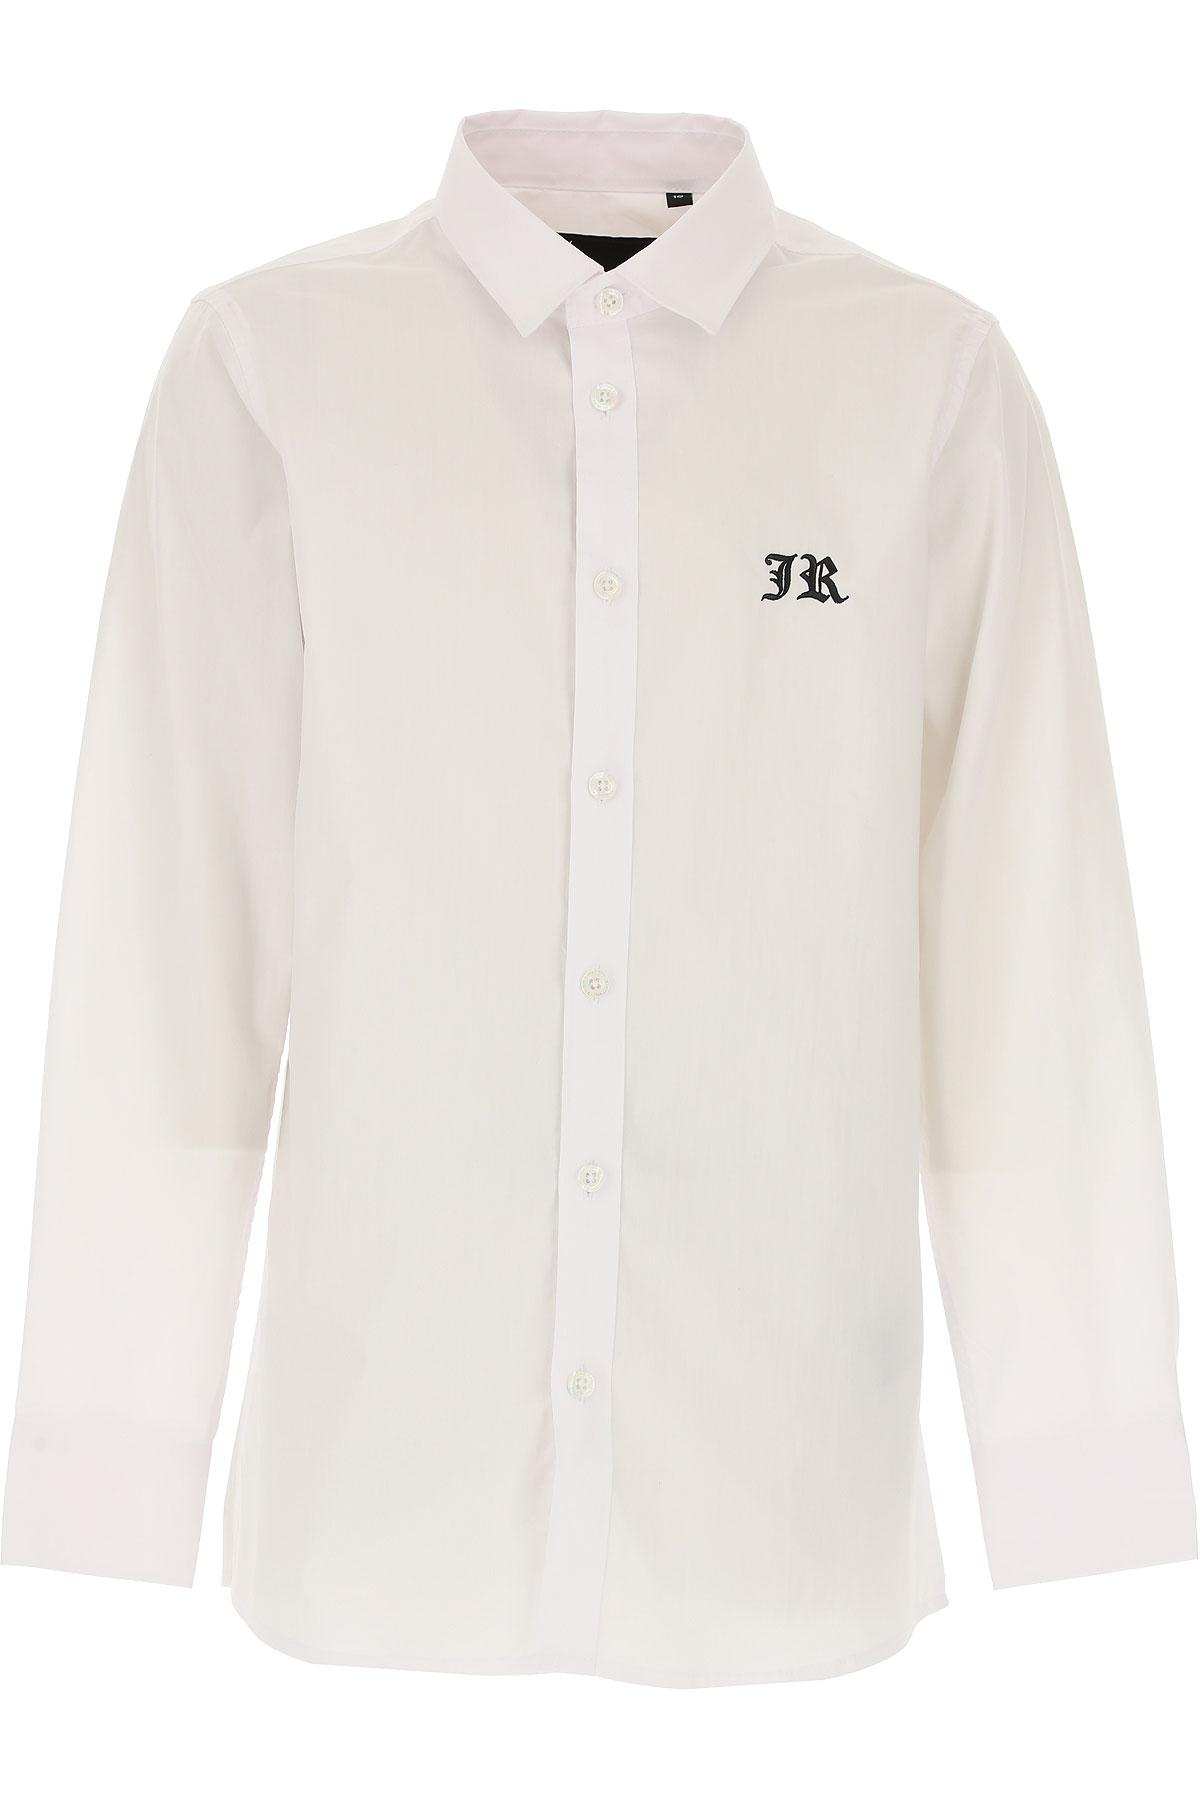 Richmond Chemises Enfant pour Garçon Pas cher en Soldes, Blanc, Coton, 2019, 10Y 12Y 14Y 16Y 8Y